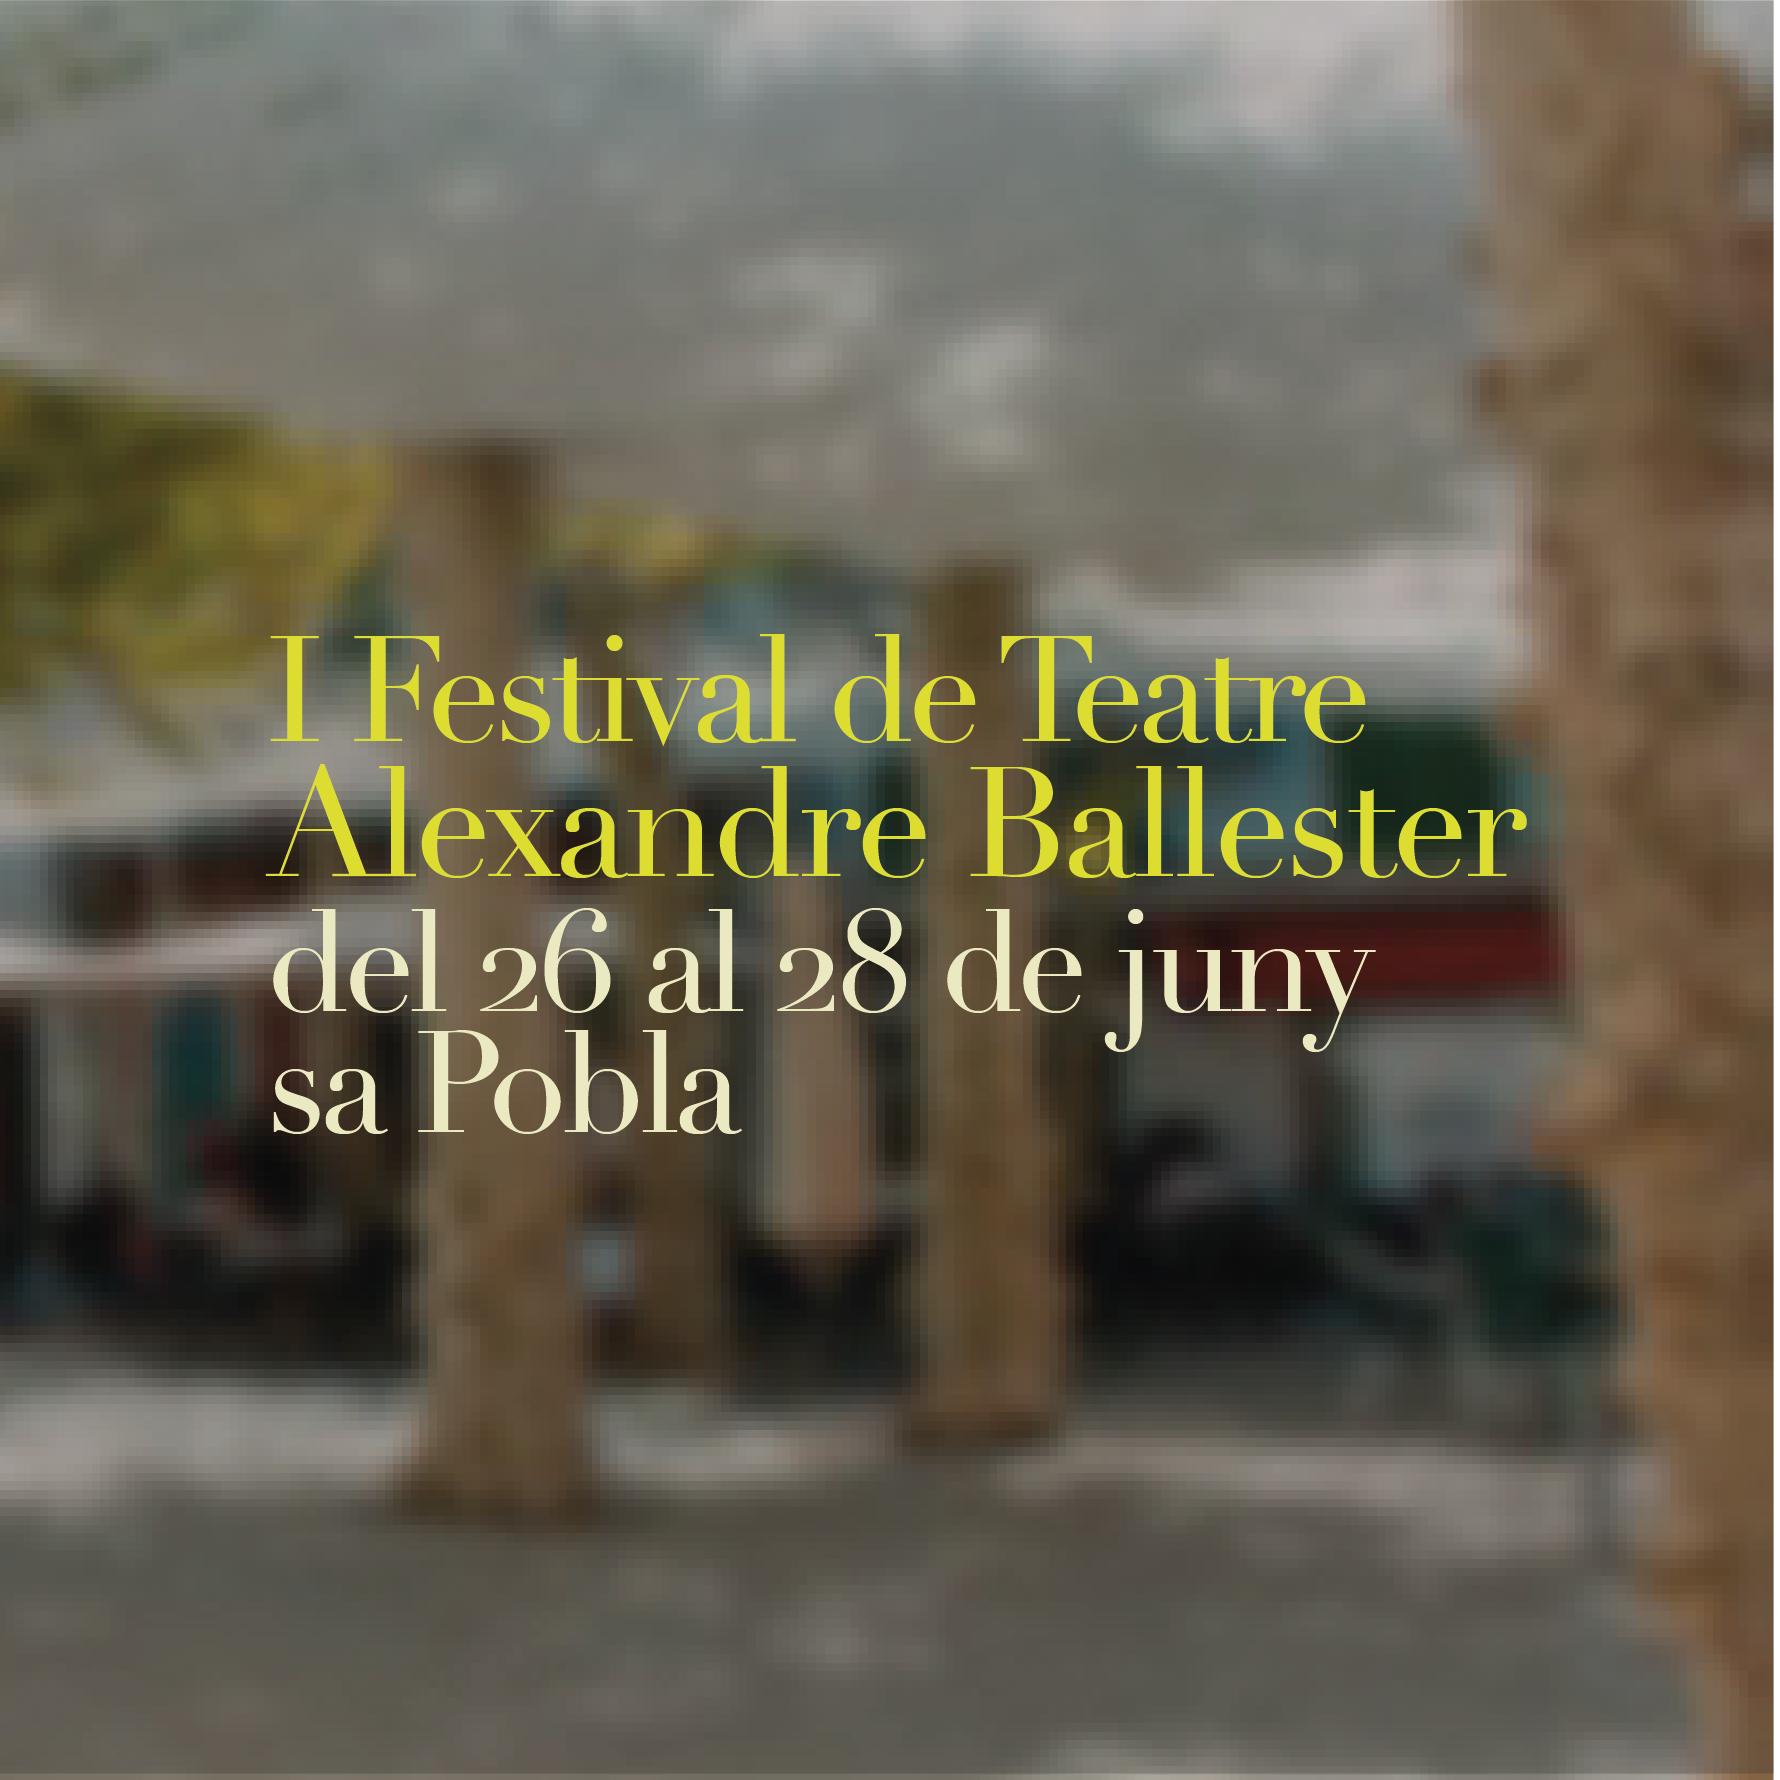 Imatge del festival